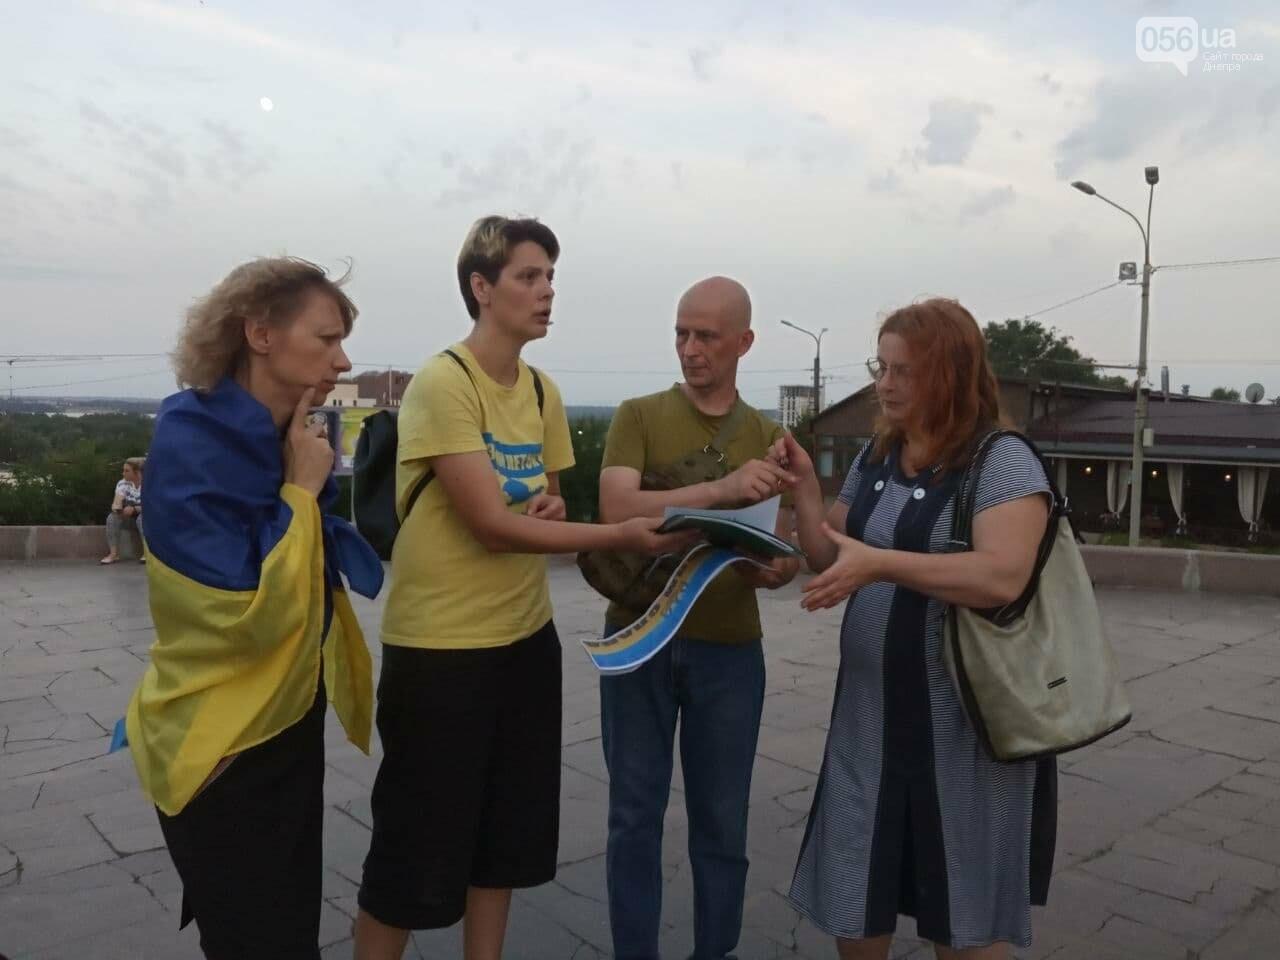 В Днепре активисты заявили, что победят Путина, - ФОТО, ВИДЕО, фото-14